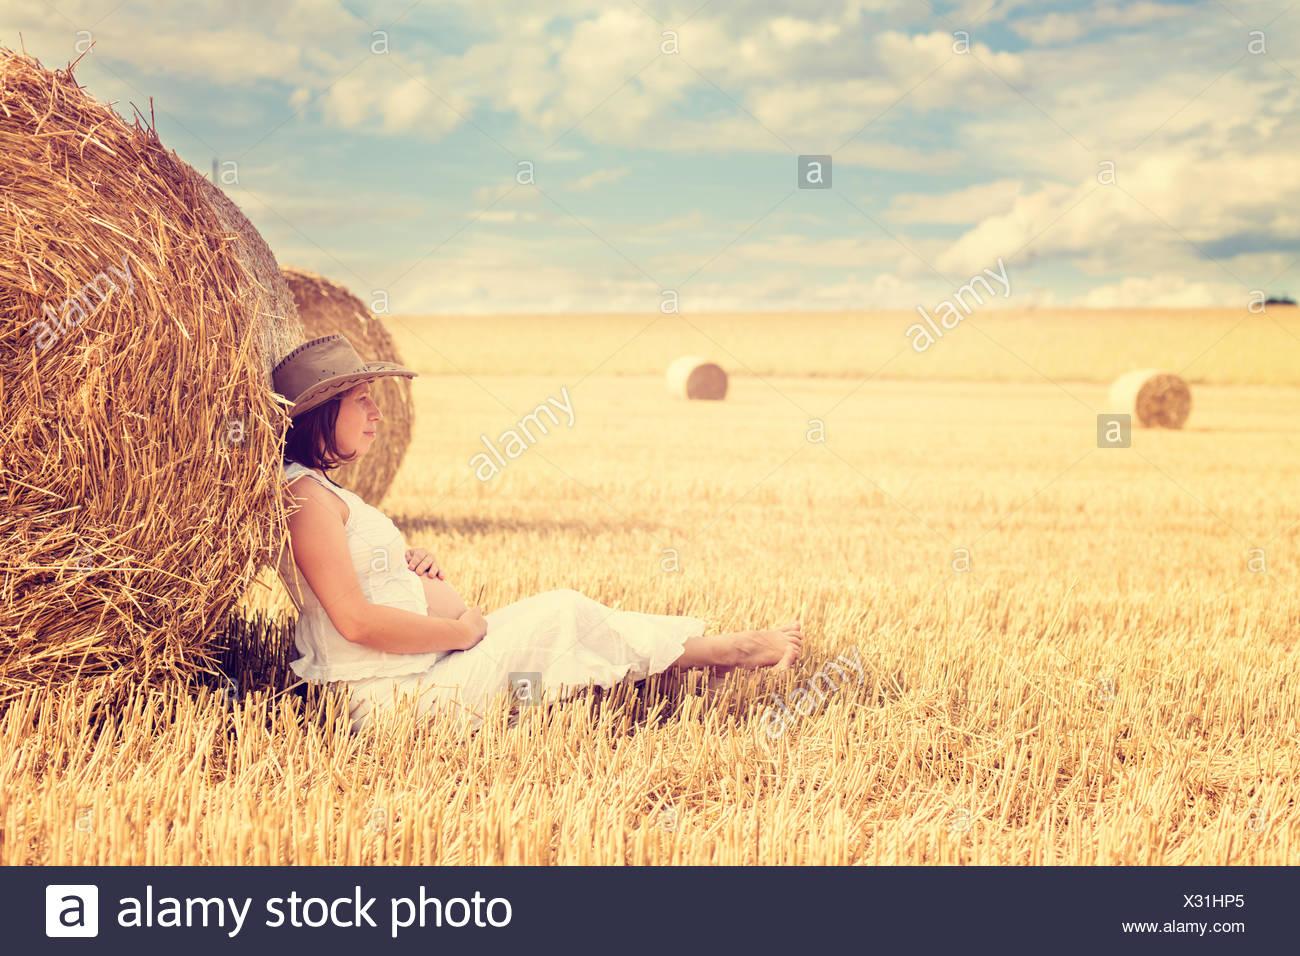 Schwangere Frau lehnte sich gegen einen Heuballen in einem Feld Stockbild